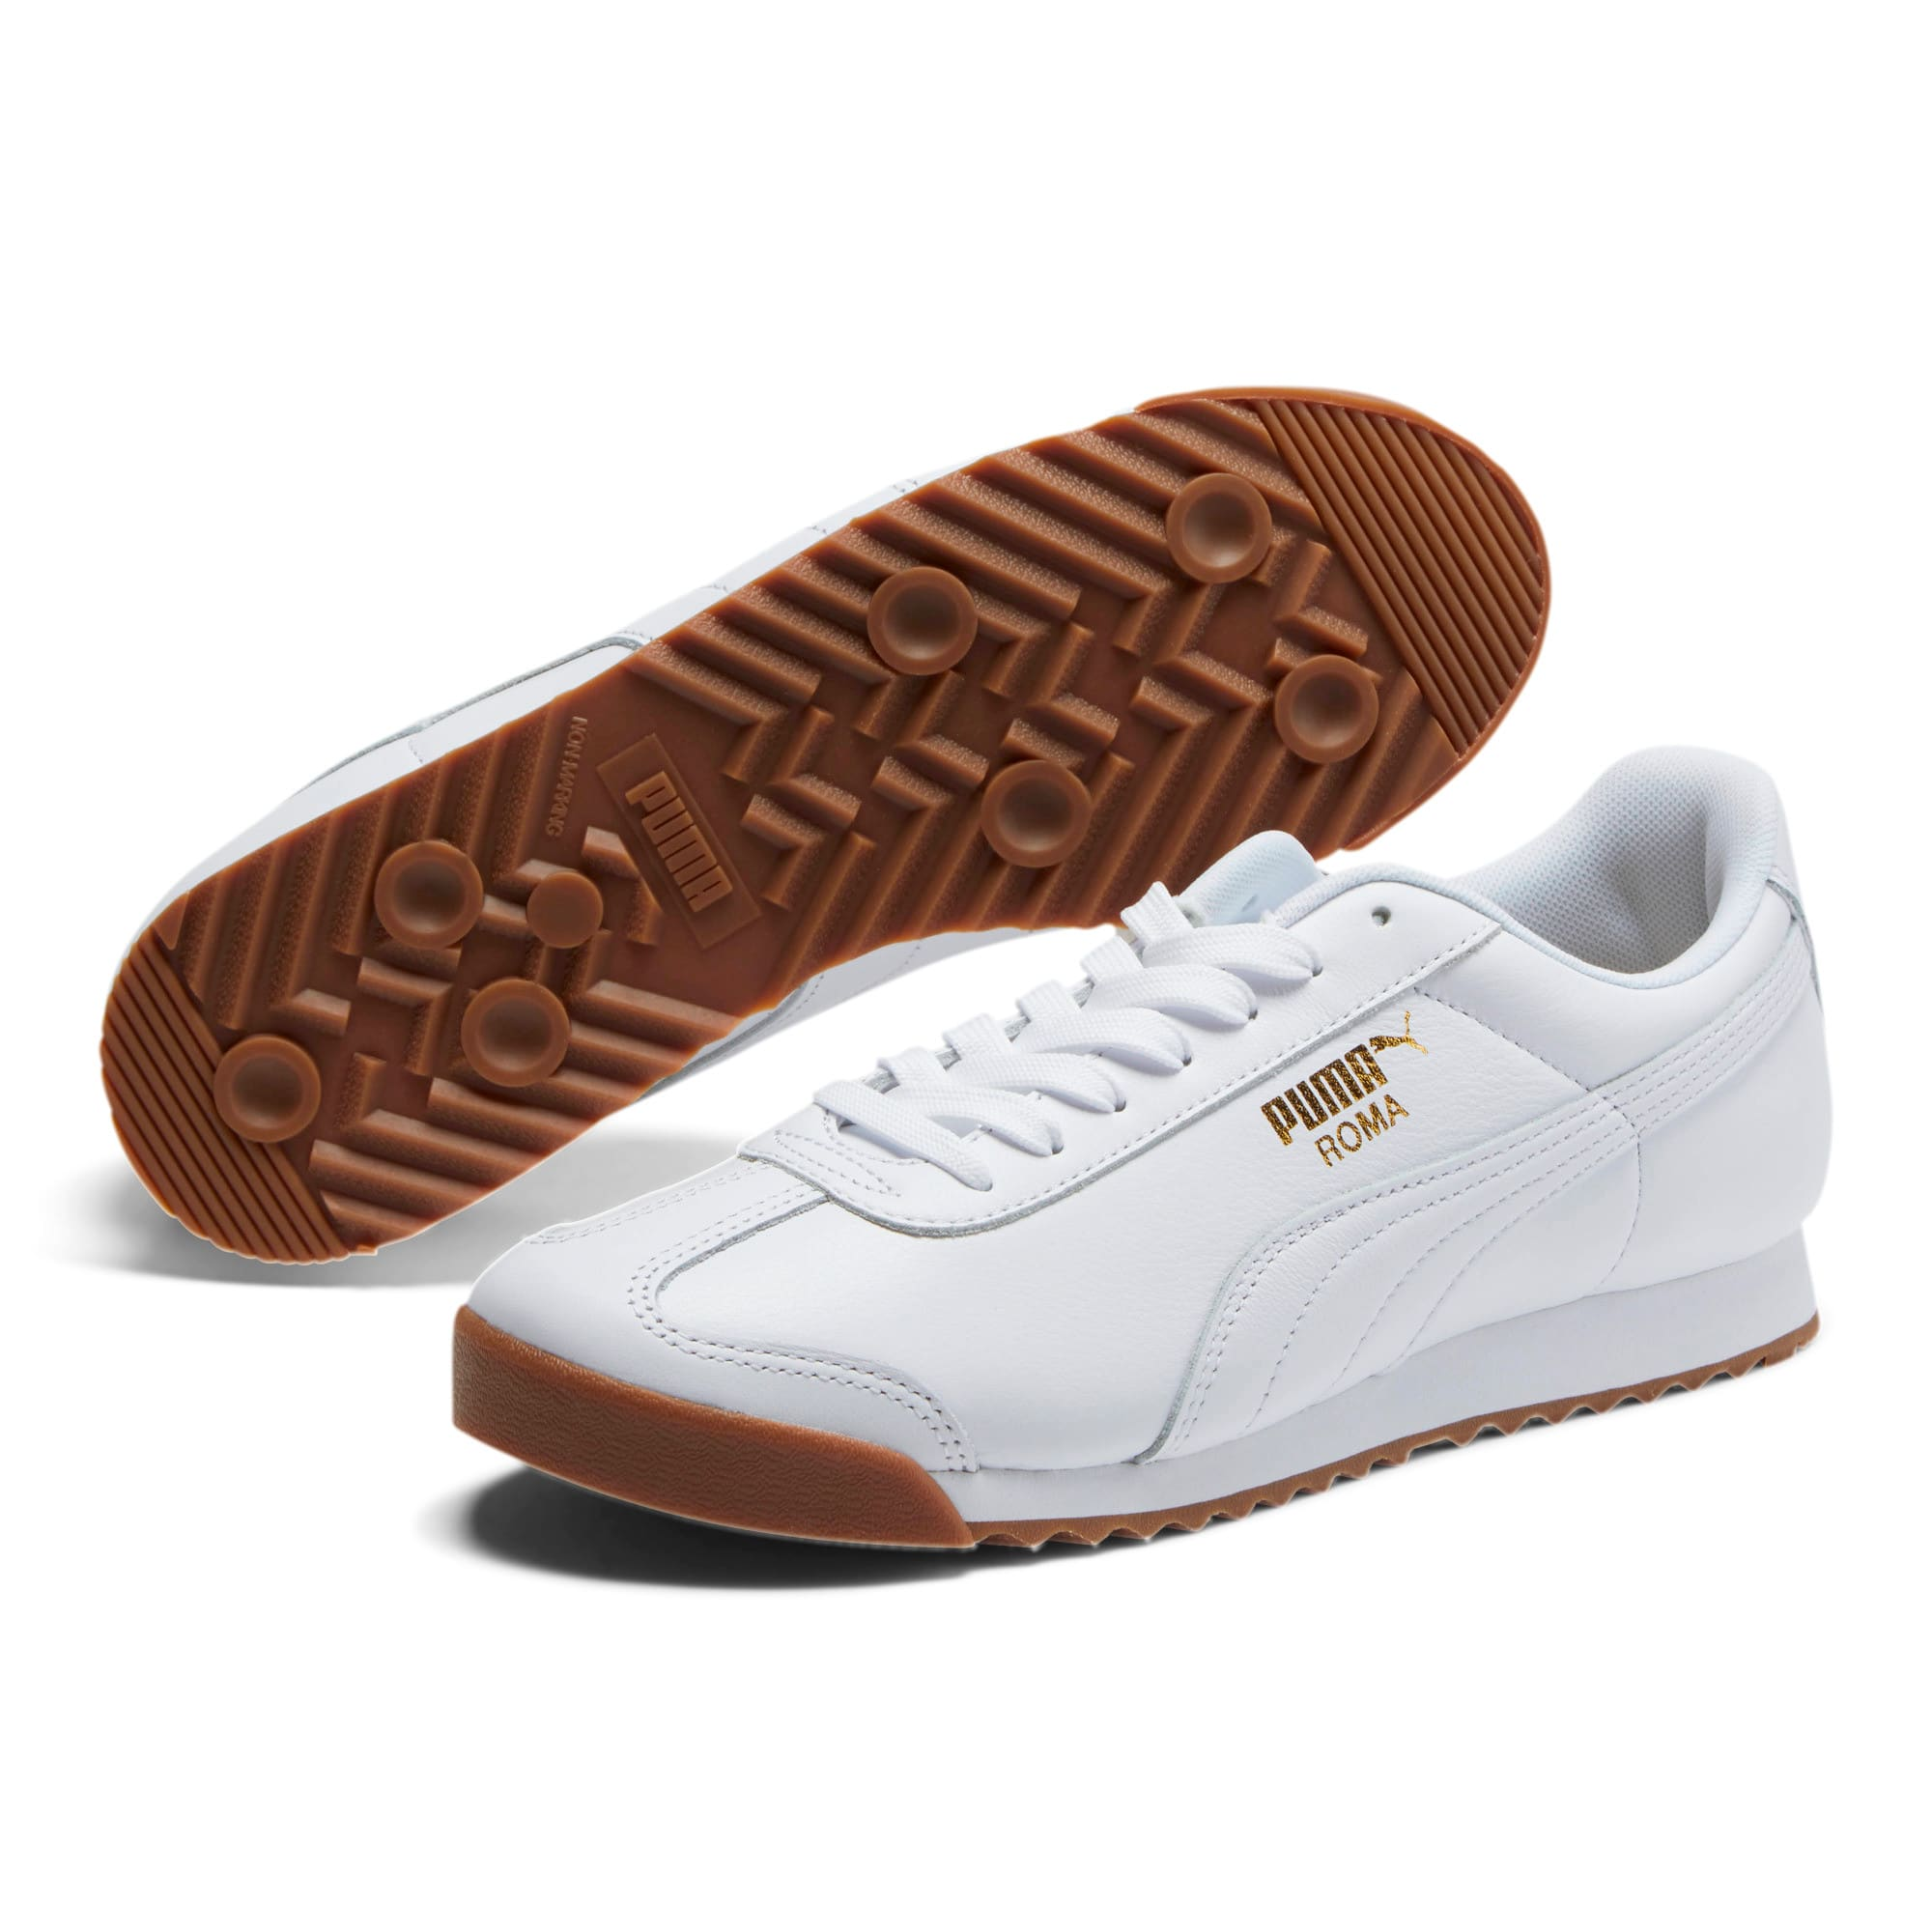 Thumbnail 2 of Roma Classic Gum Sneakers, Puma White-Puma Team Gold, medium